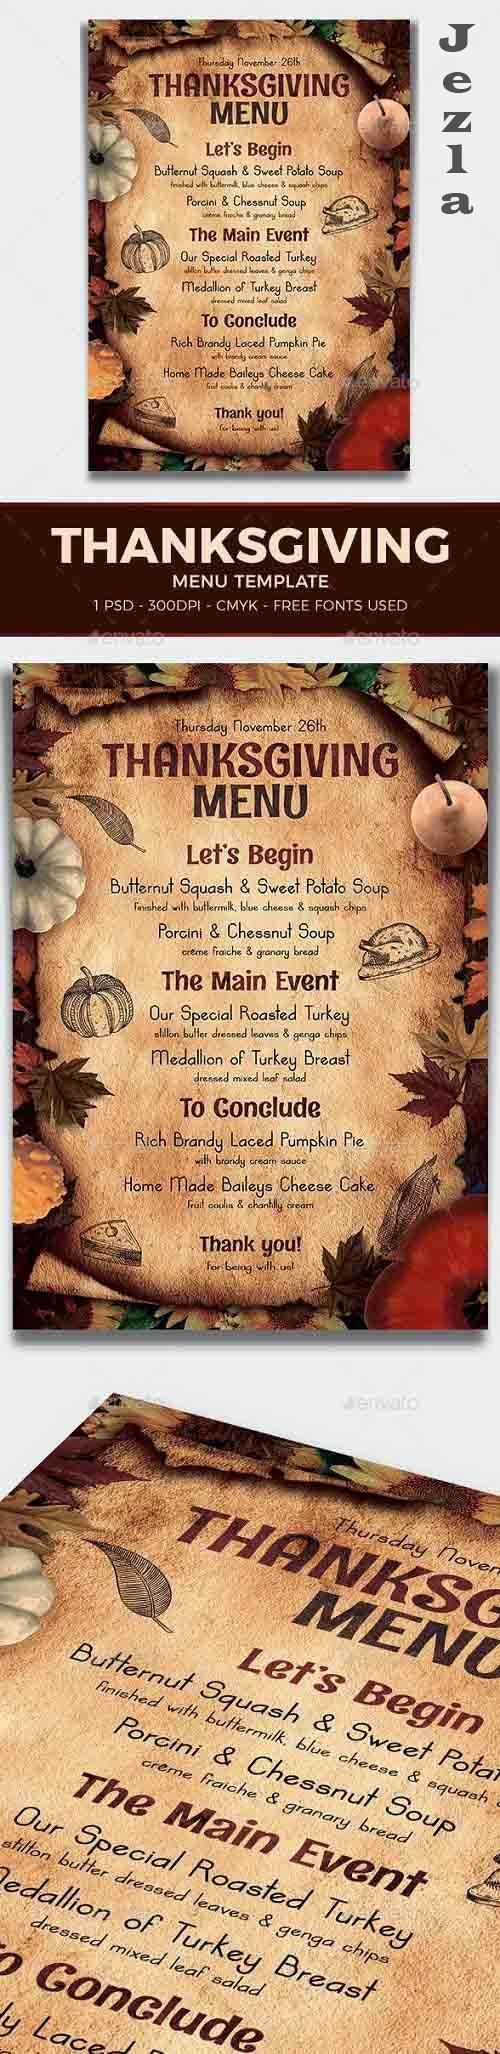 Thanksgiving Menu Template V2 - 17774429 - 887796